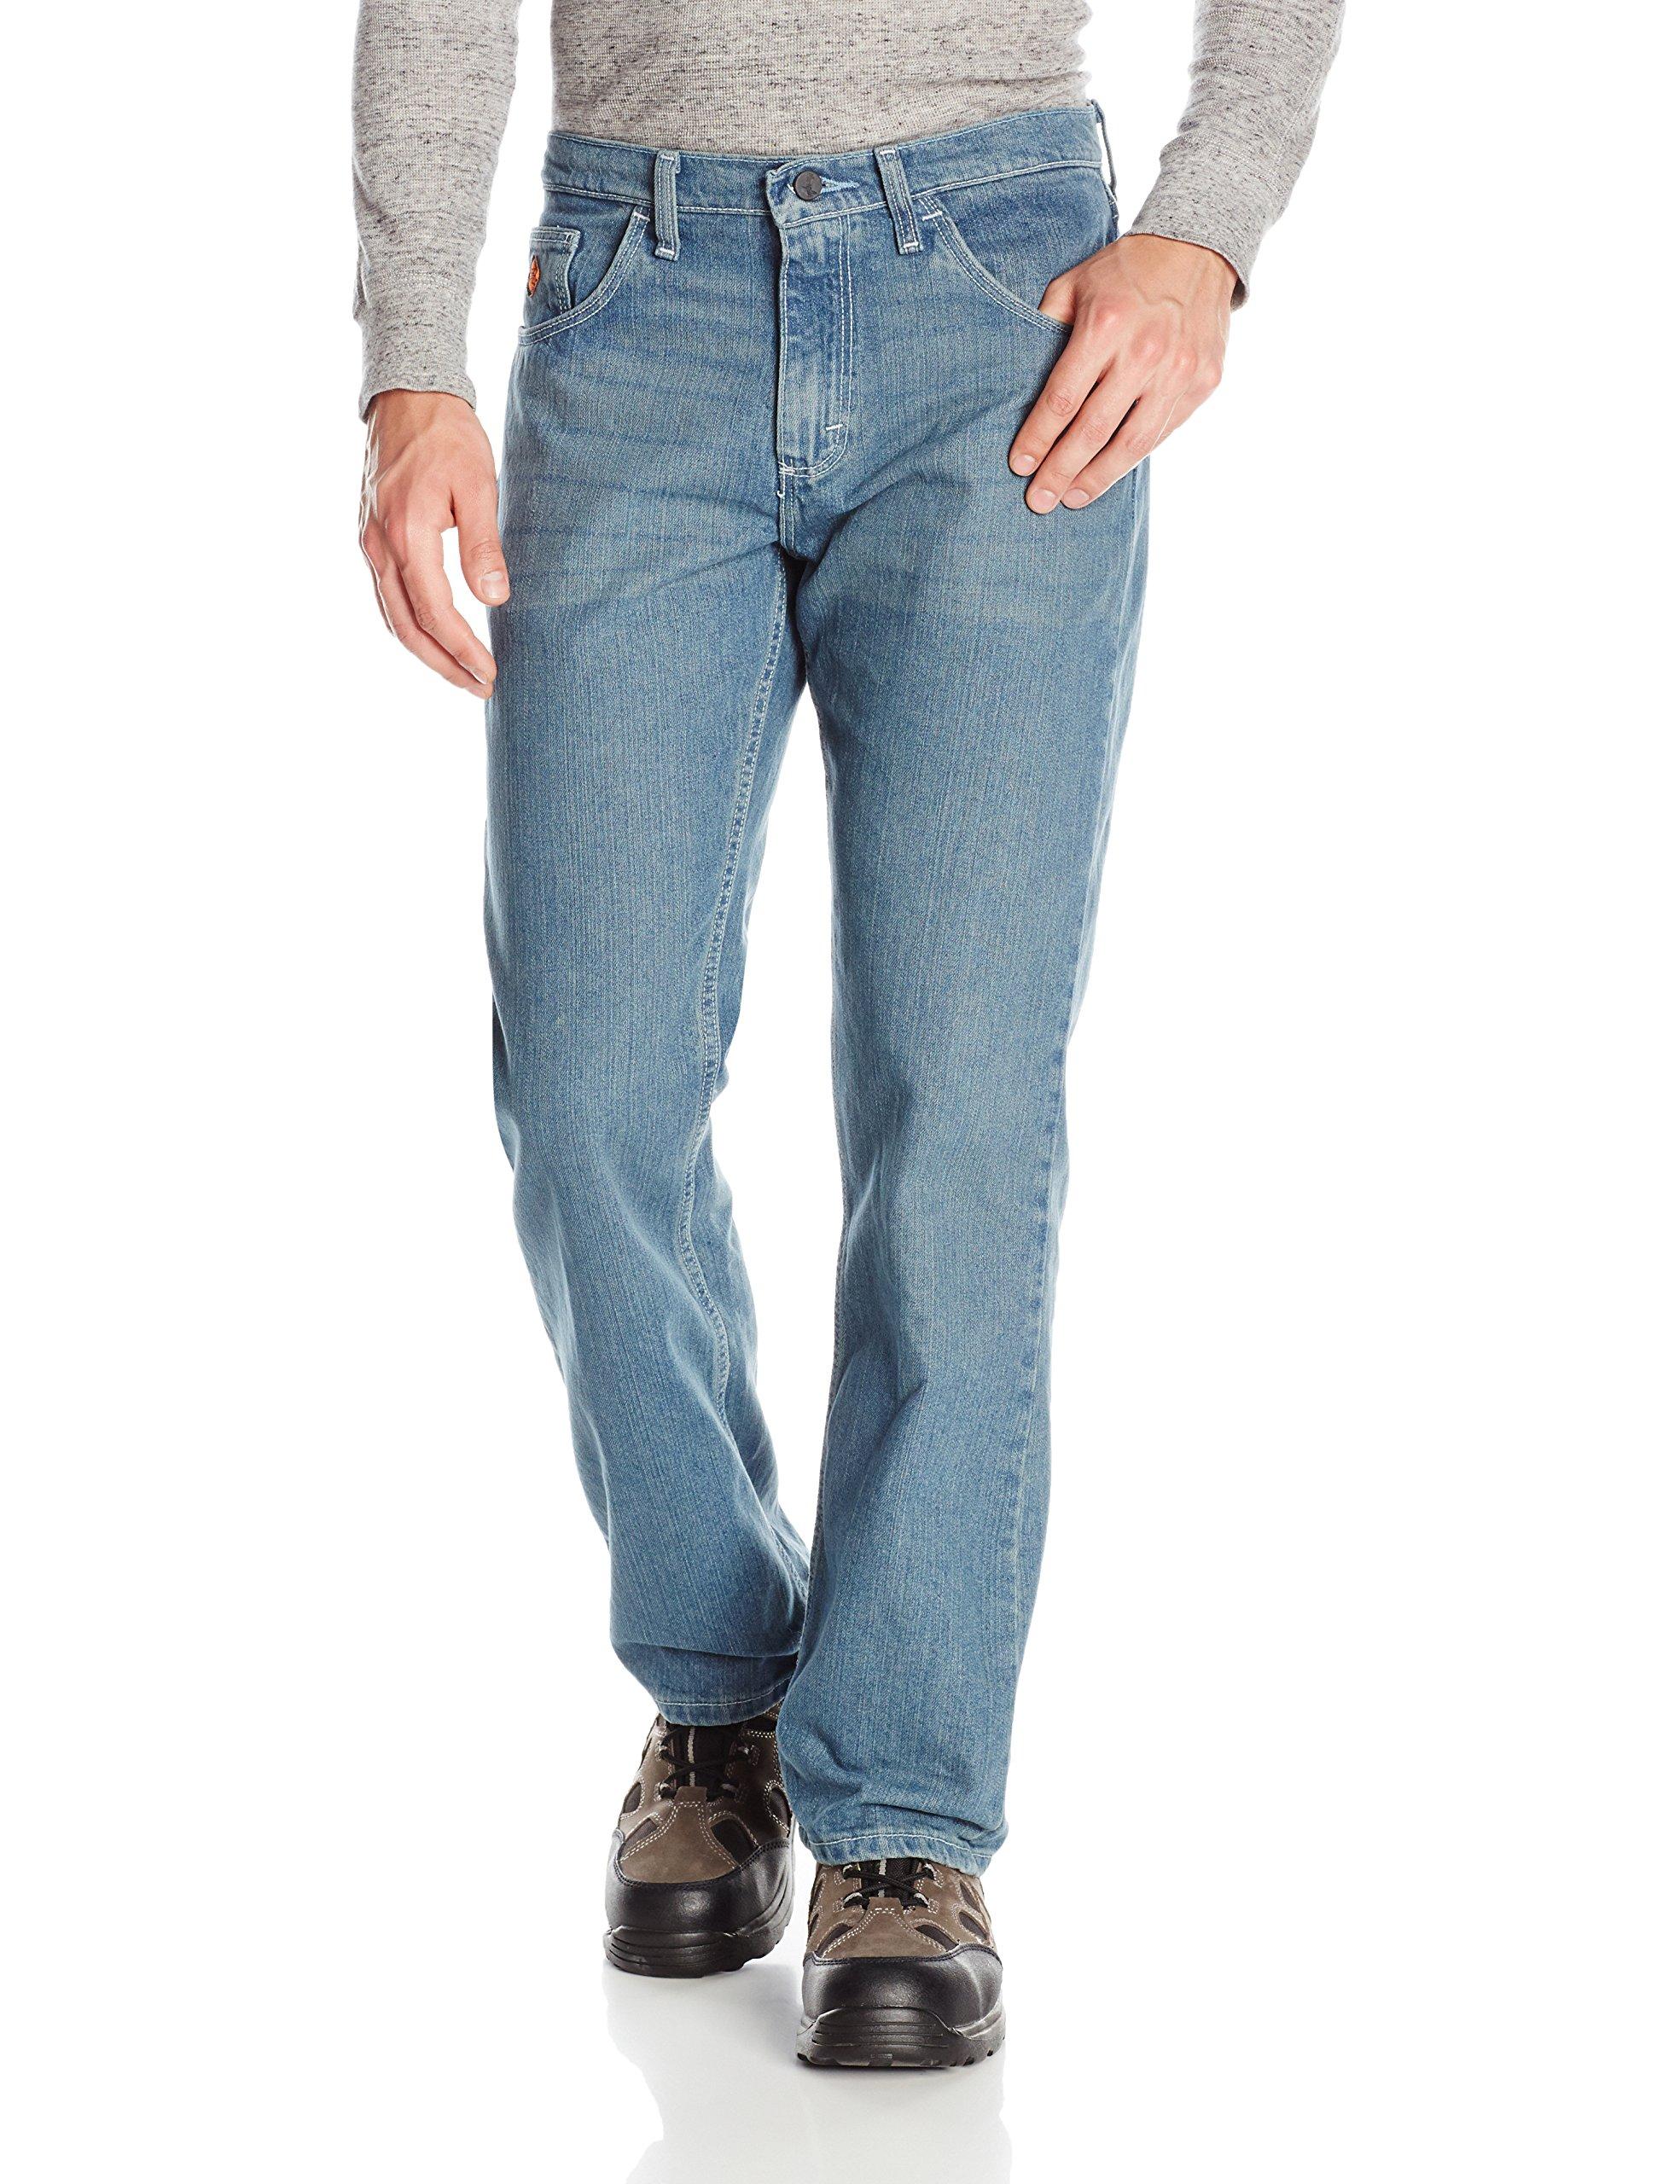 Wrangler Men's 20x Flame Resistant Cool Vantage Boot Cut Jean, Vintage, 36x30